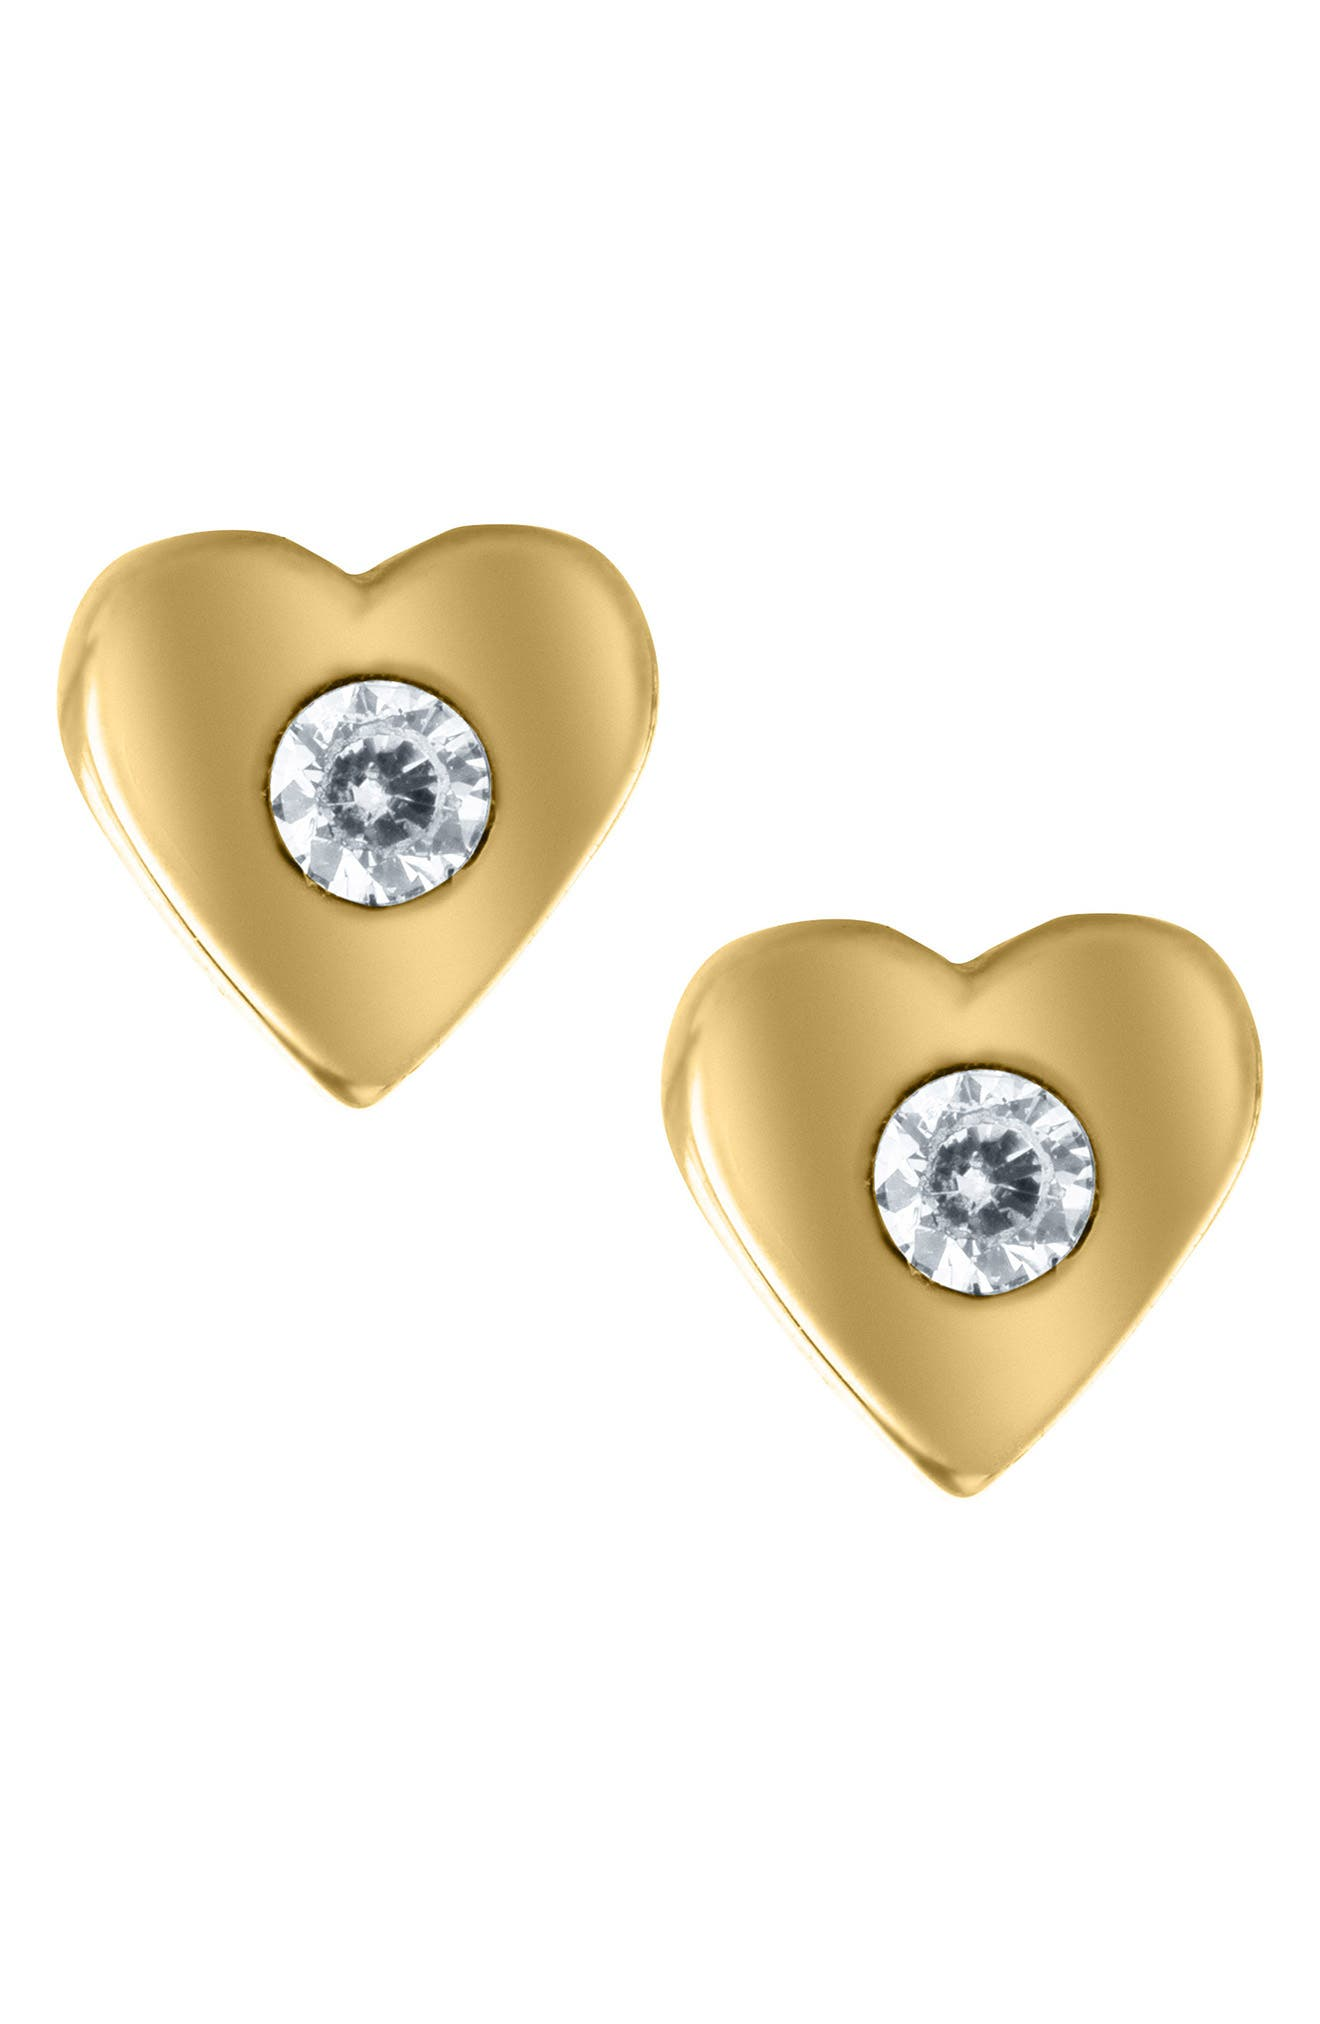 14k Gold & Cubic Zirconia Heart Earrings,                             Main thumbnail 1, color,                             Gold